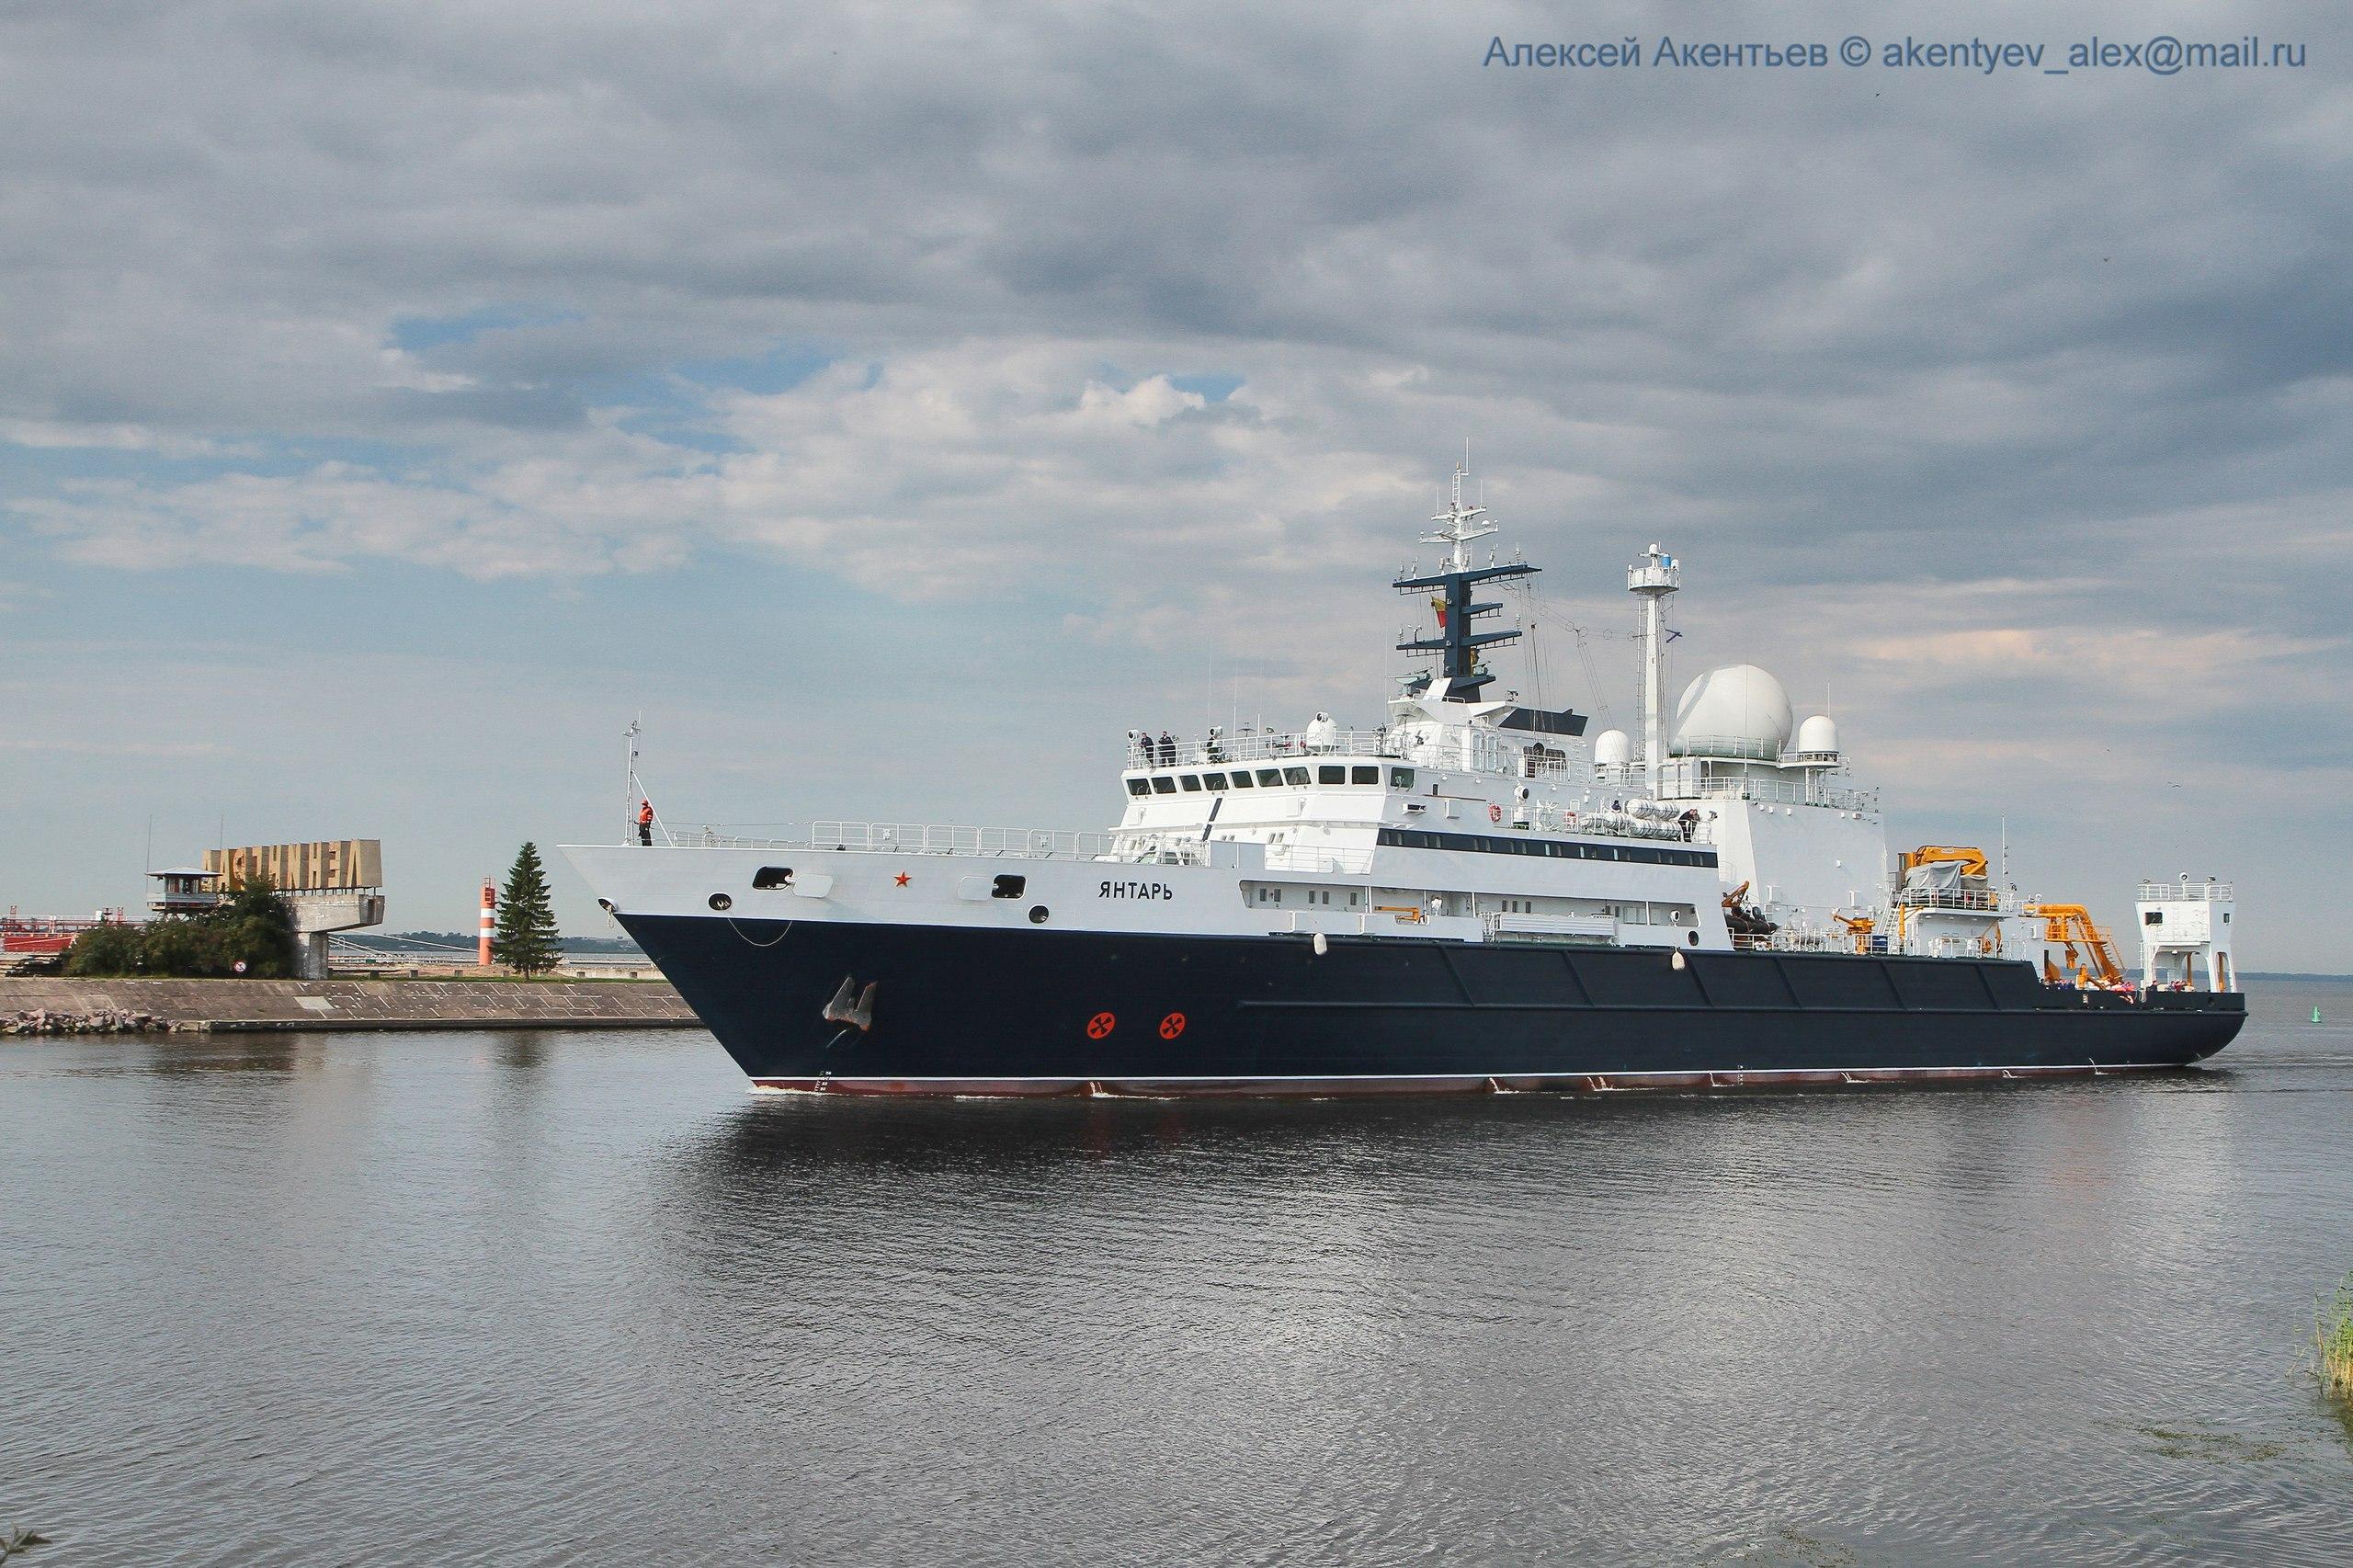 Pentágono suspeita que navio de inteligência russo execute atividades ao largo da costa dos EUA